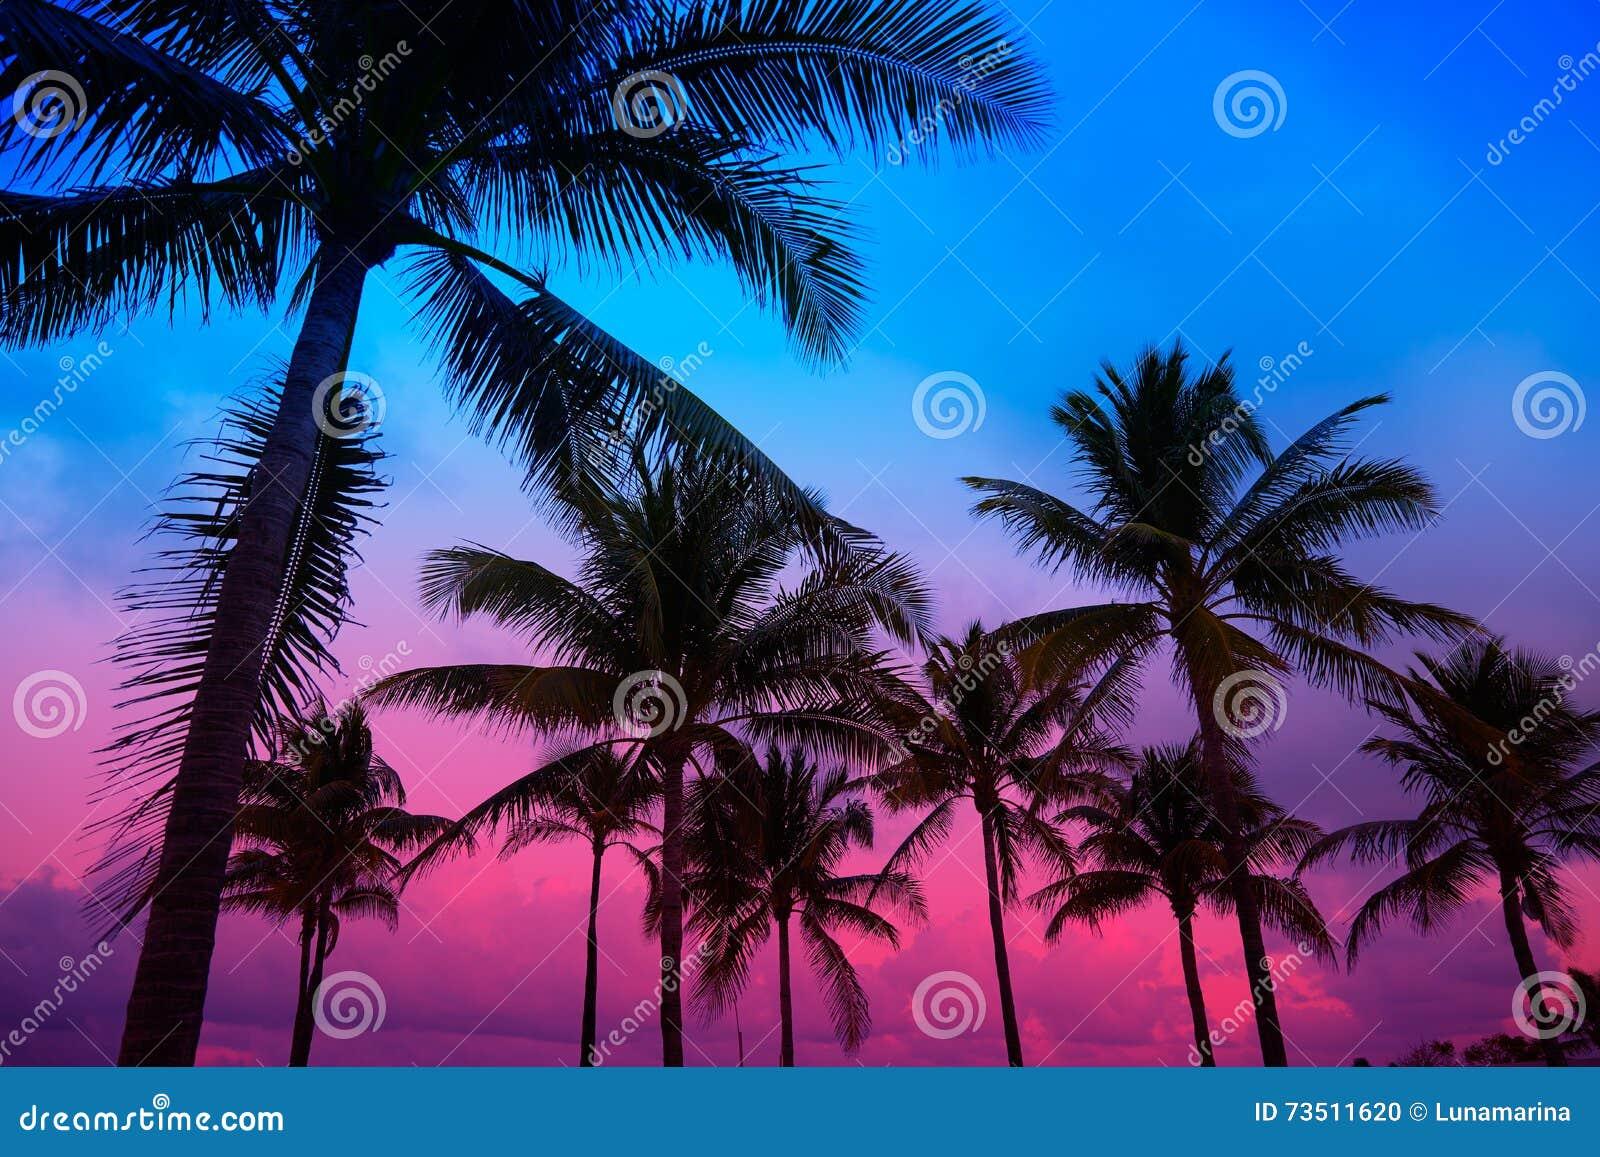 Miami Beach South Sunset Palm Trees Florida